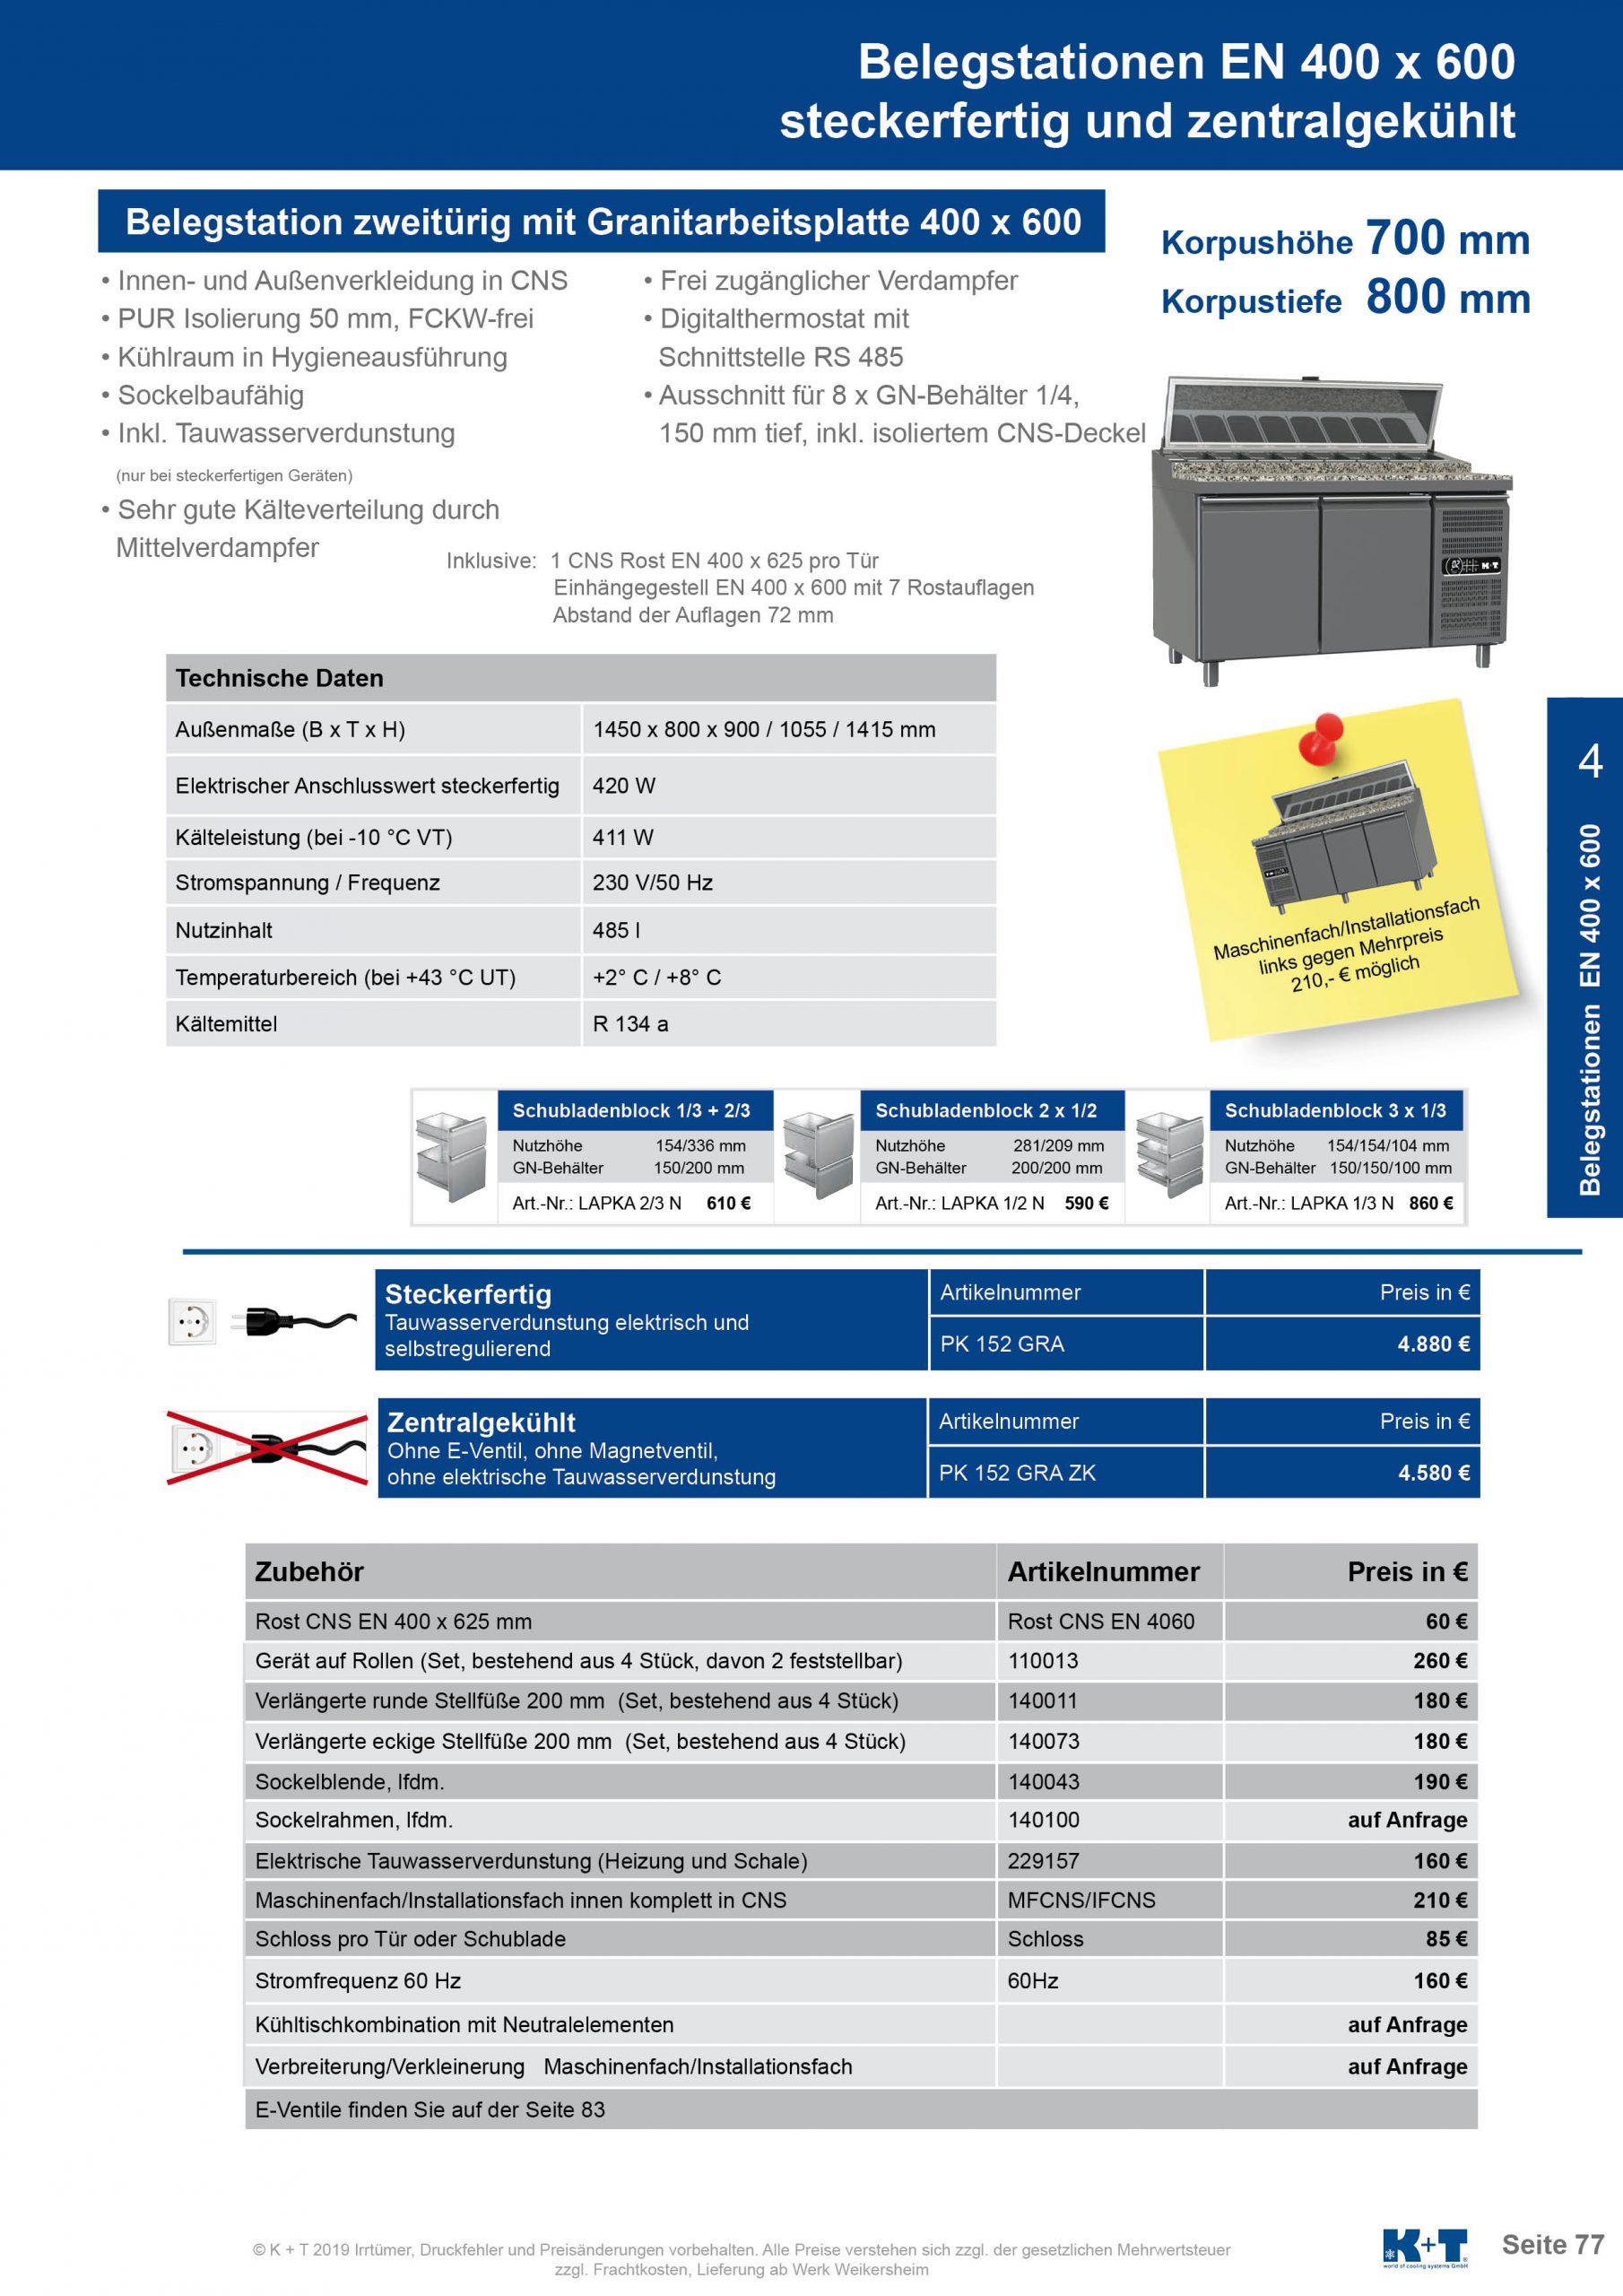 Belegstation Euronorm 400 x 600 Korpushöhe 700, Tiefe 800 steckerfertig 2